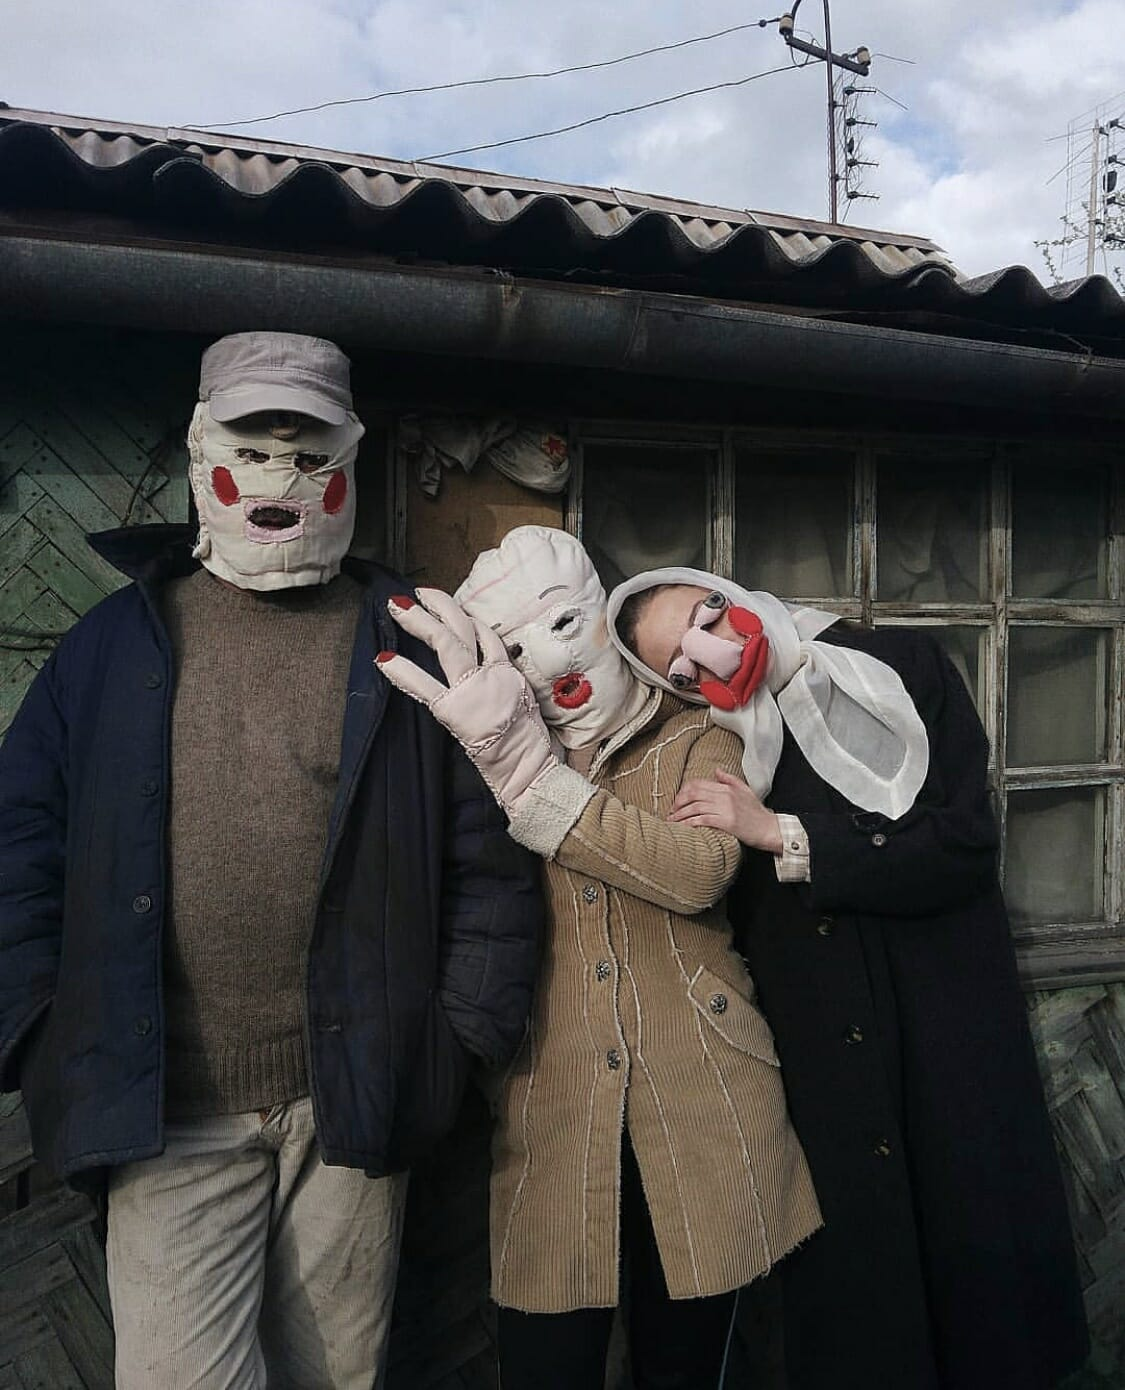 Alisa Gorshenina trois personnages ruraux